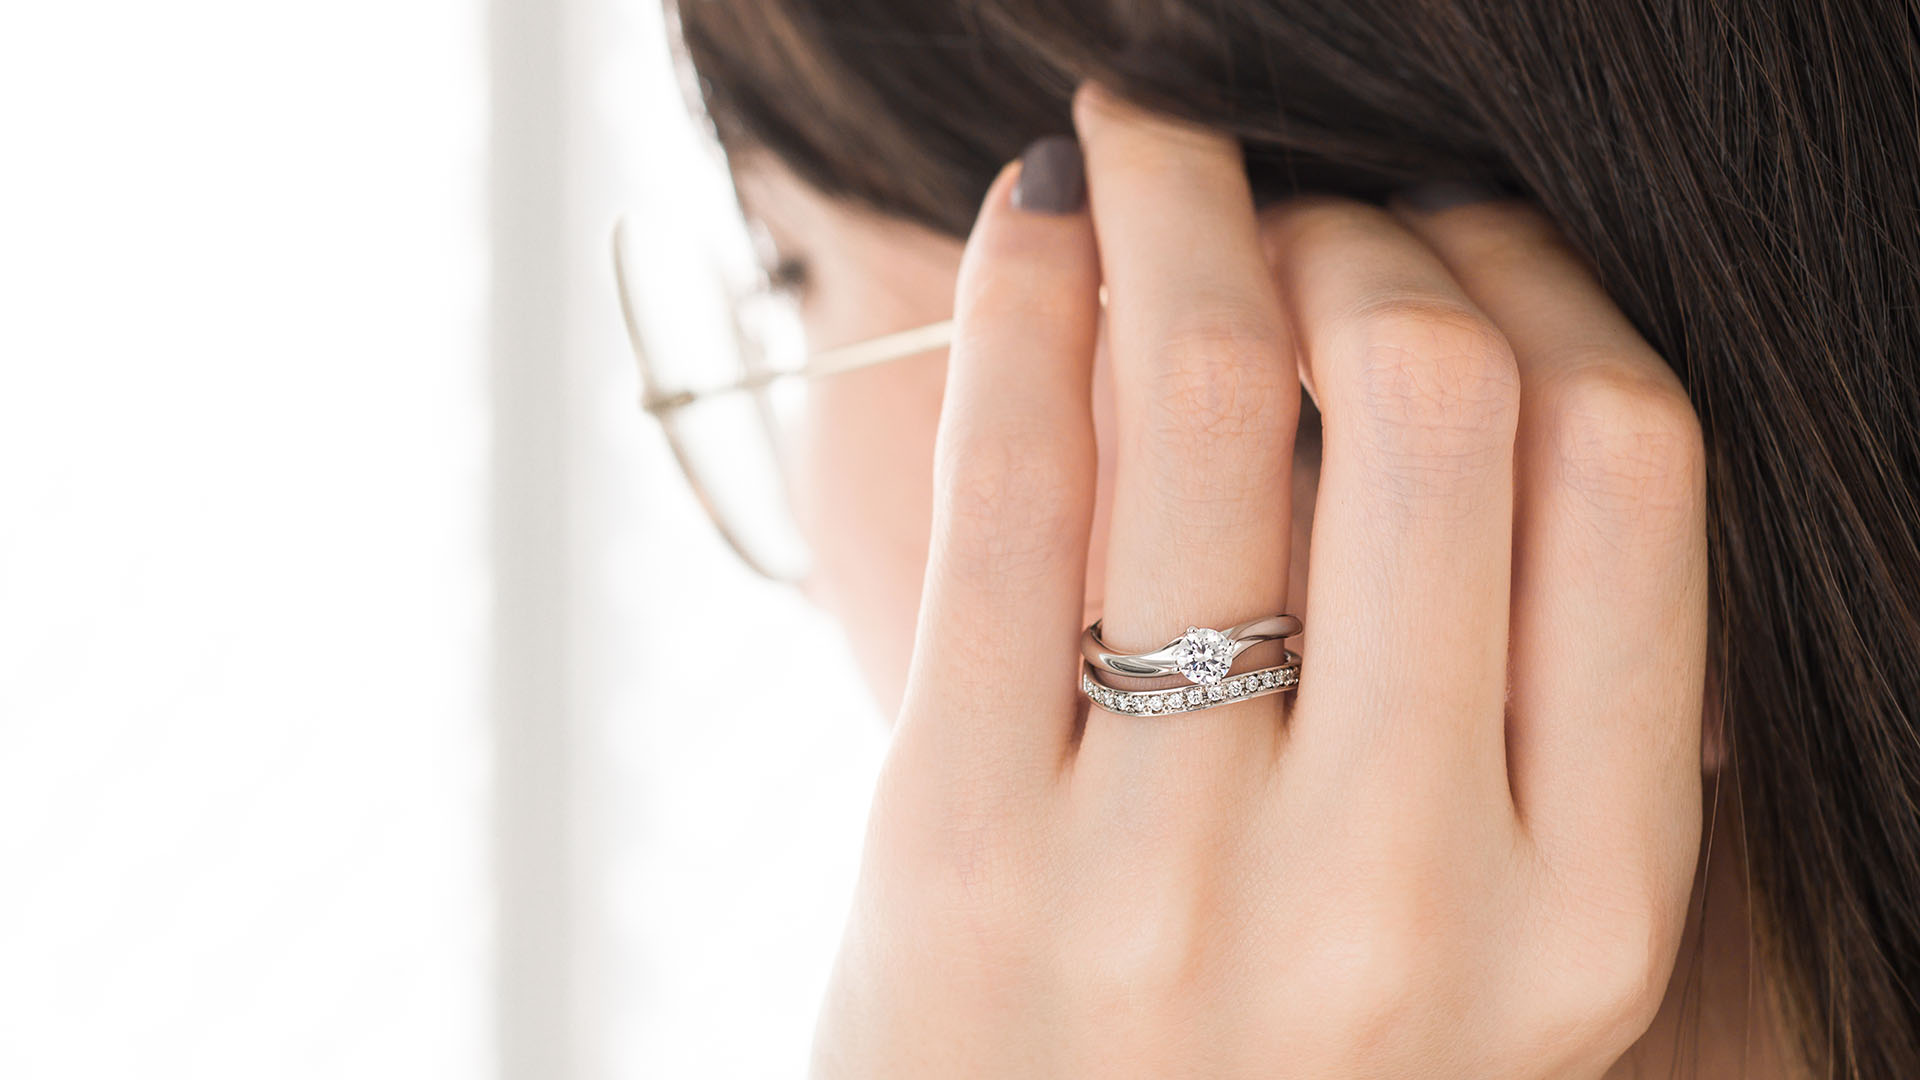 jupiter ジュピター | 婚約指輪サムネイル 3